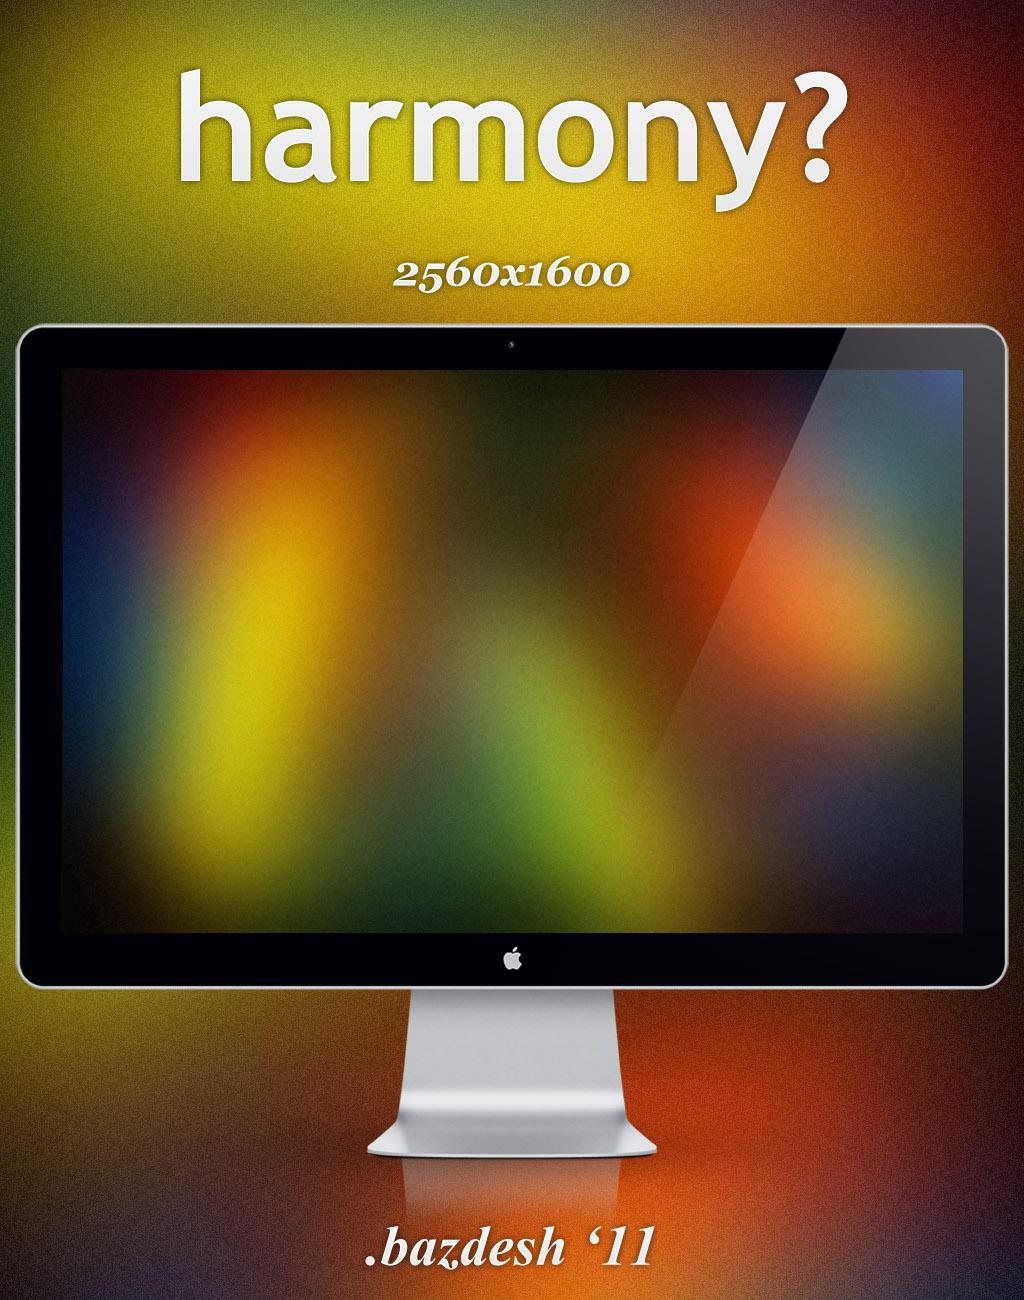 harmony? by bazdesh